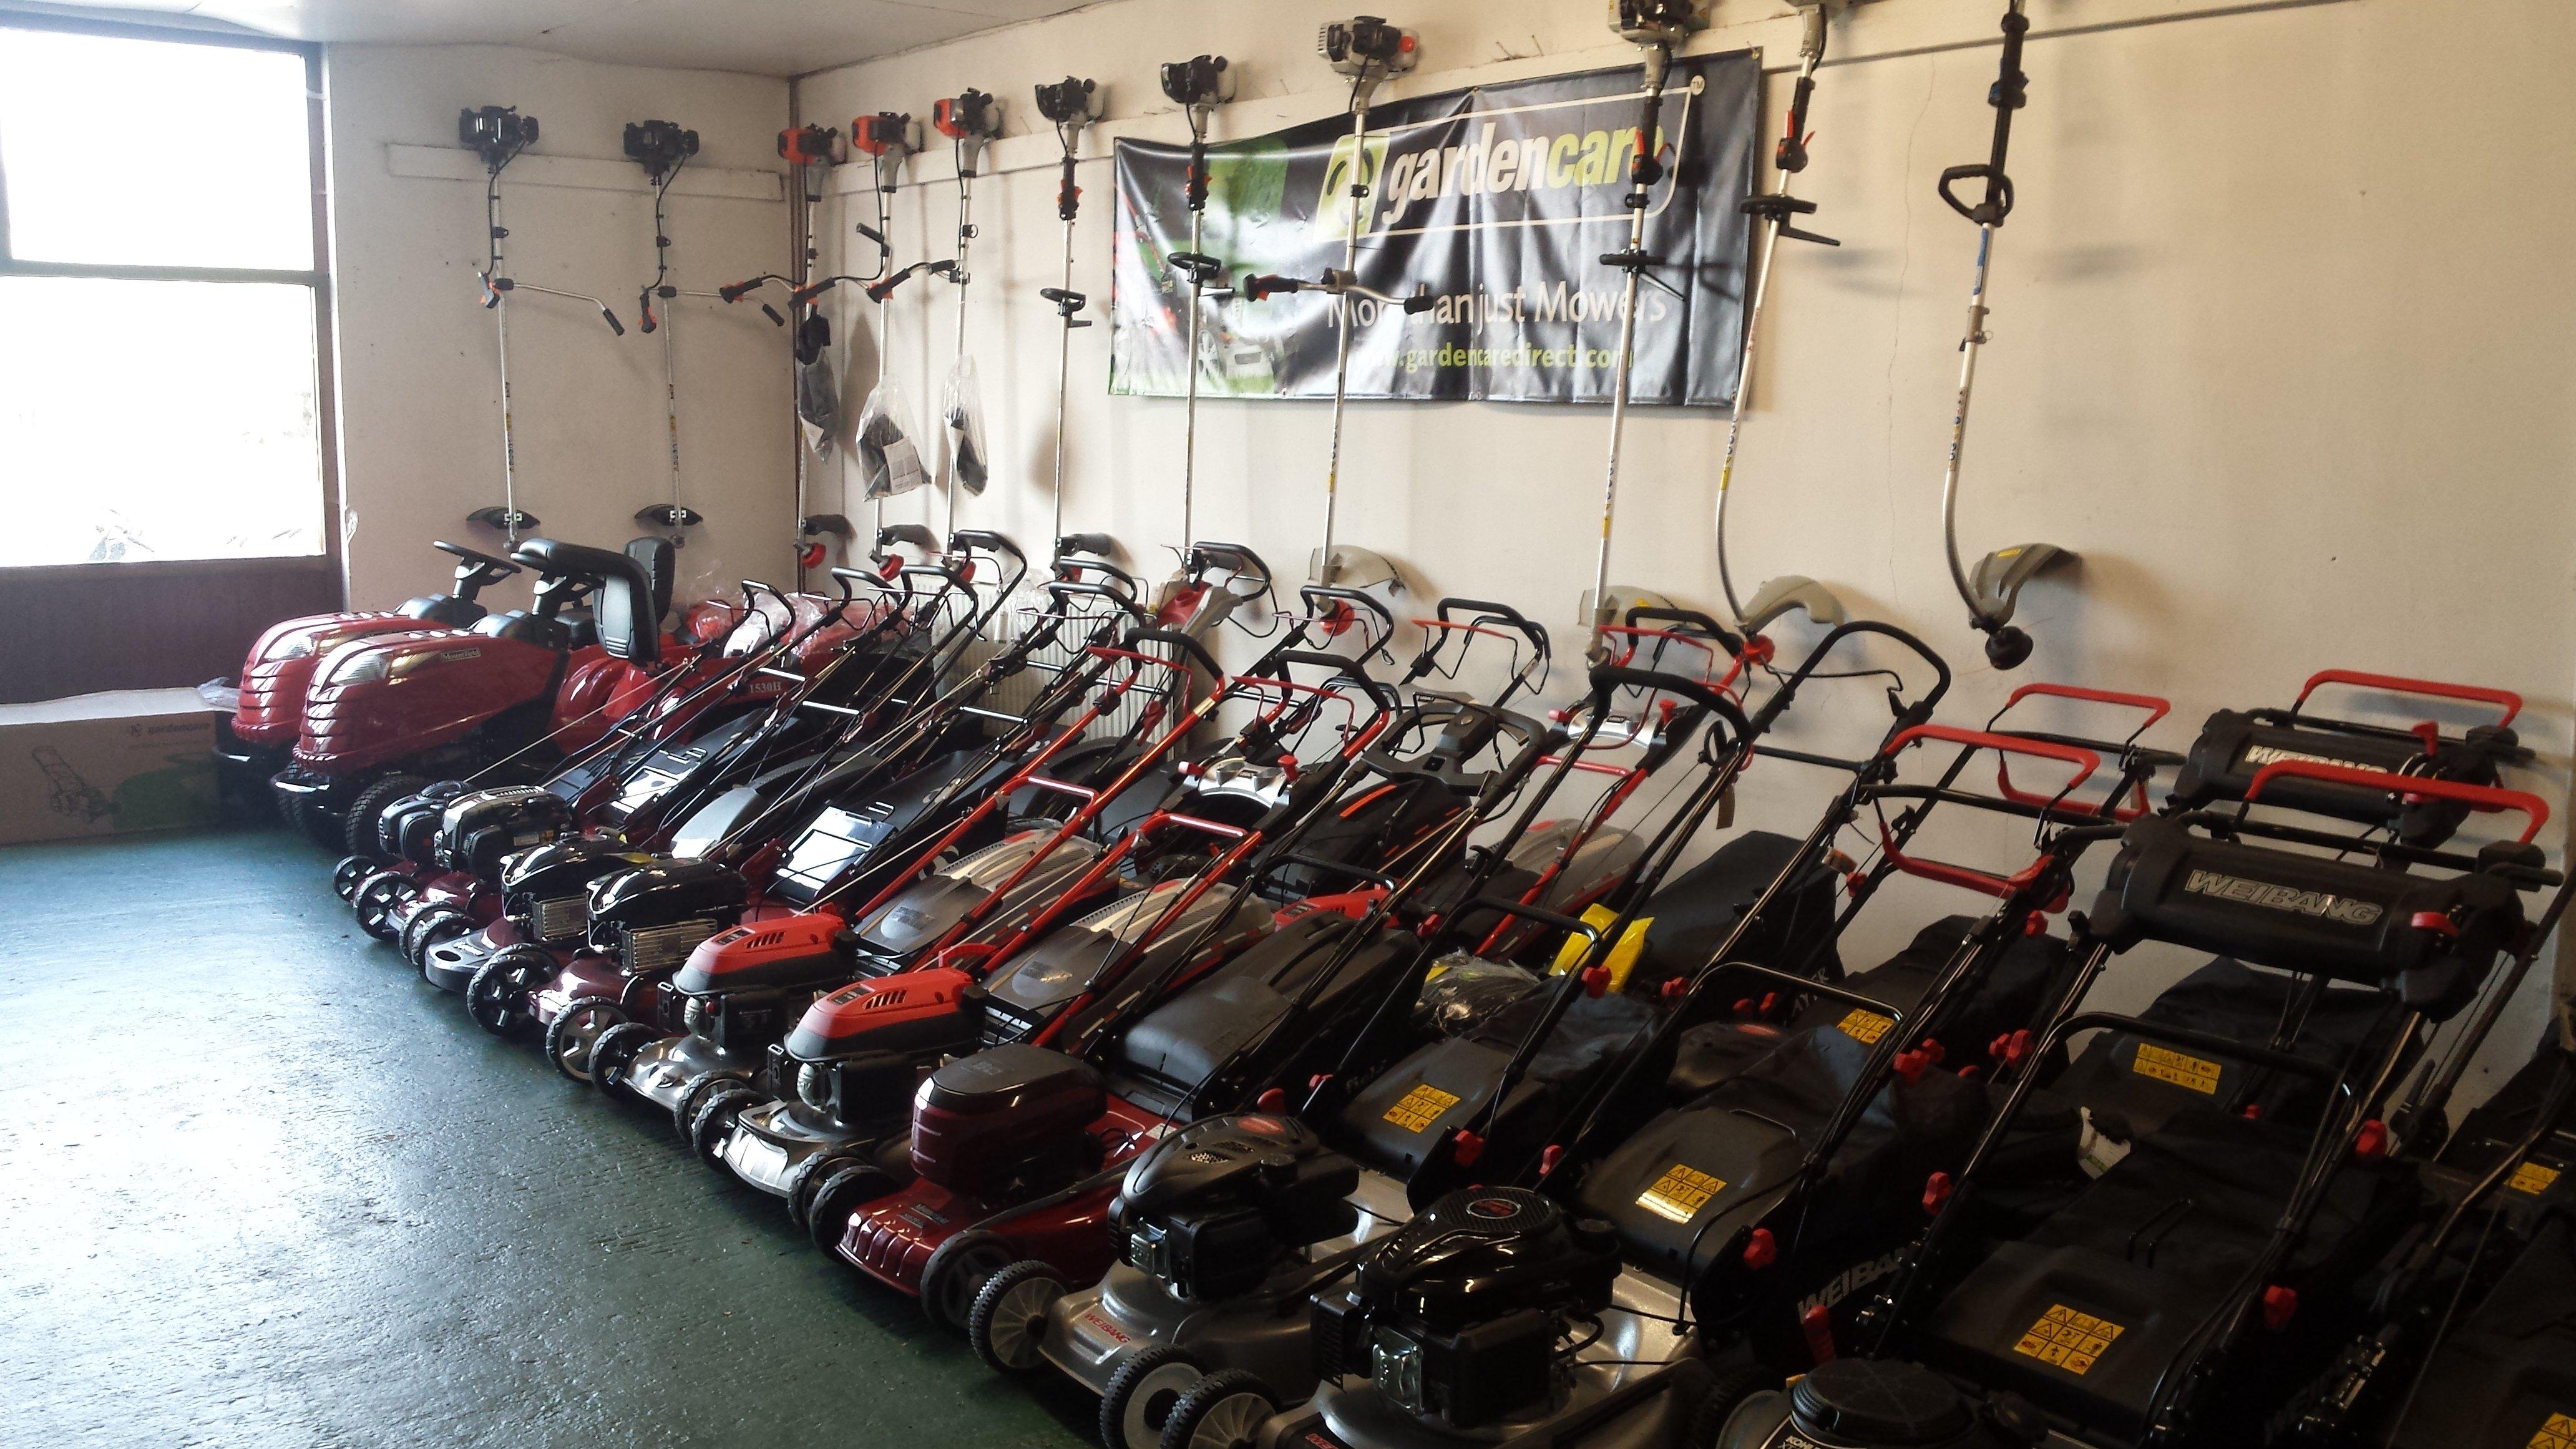 lawnmowers in stock